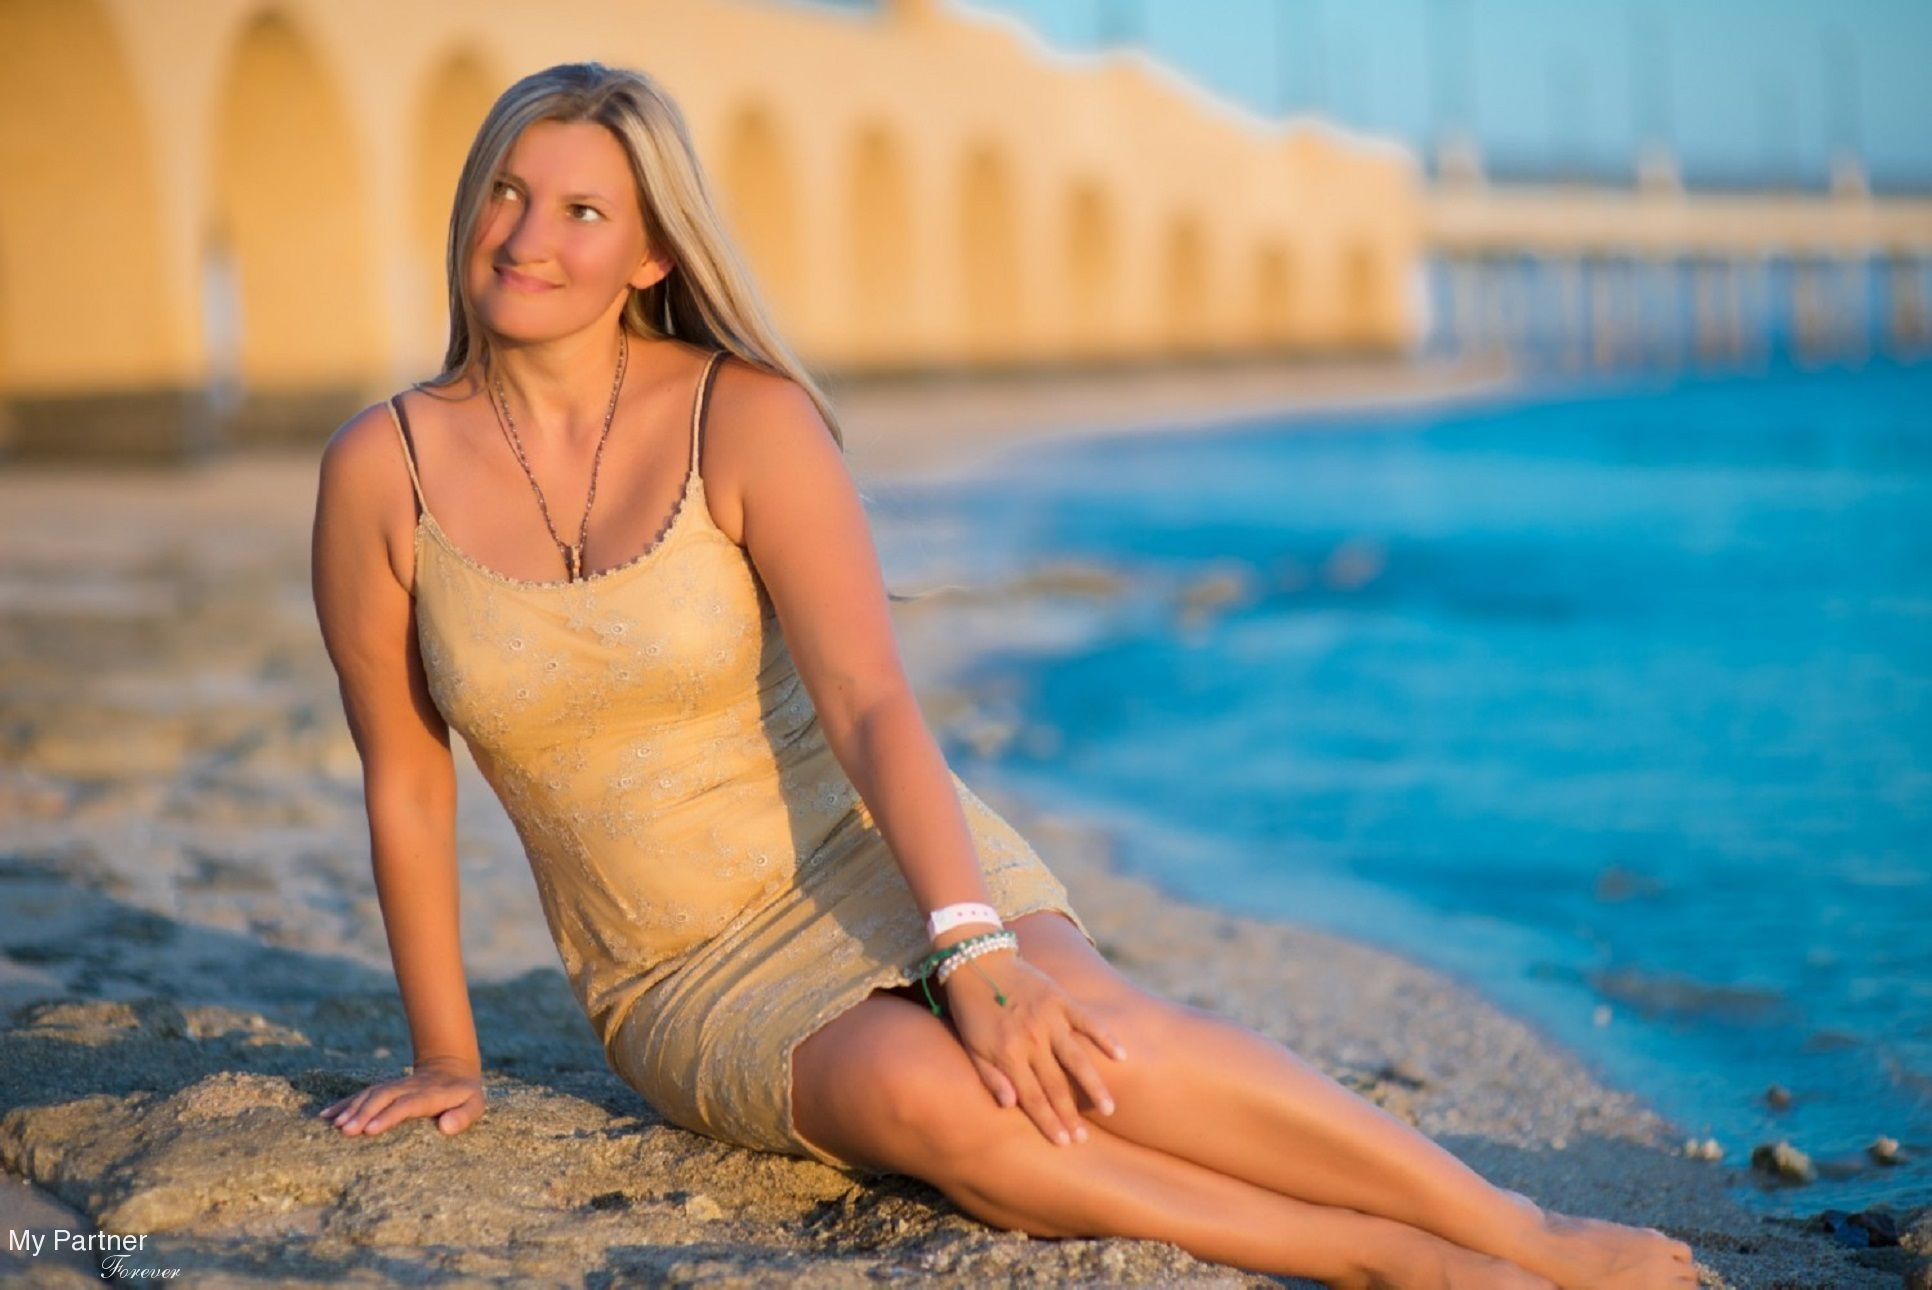 olga yurieva lysova dating websites